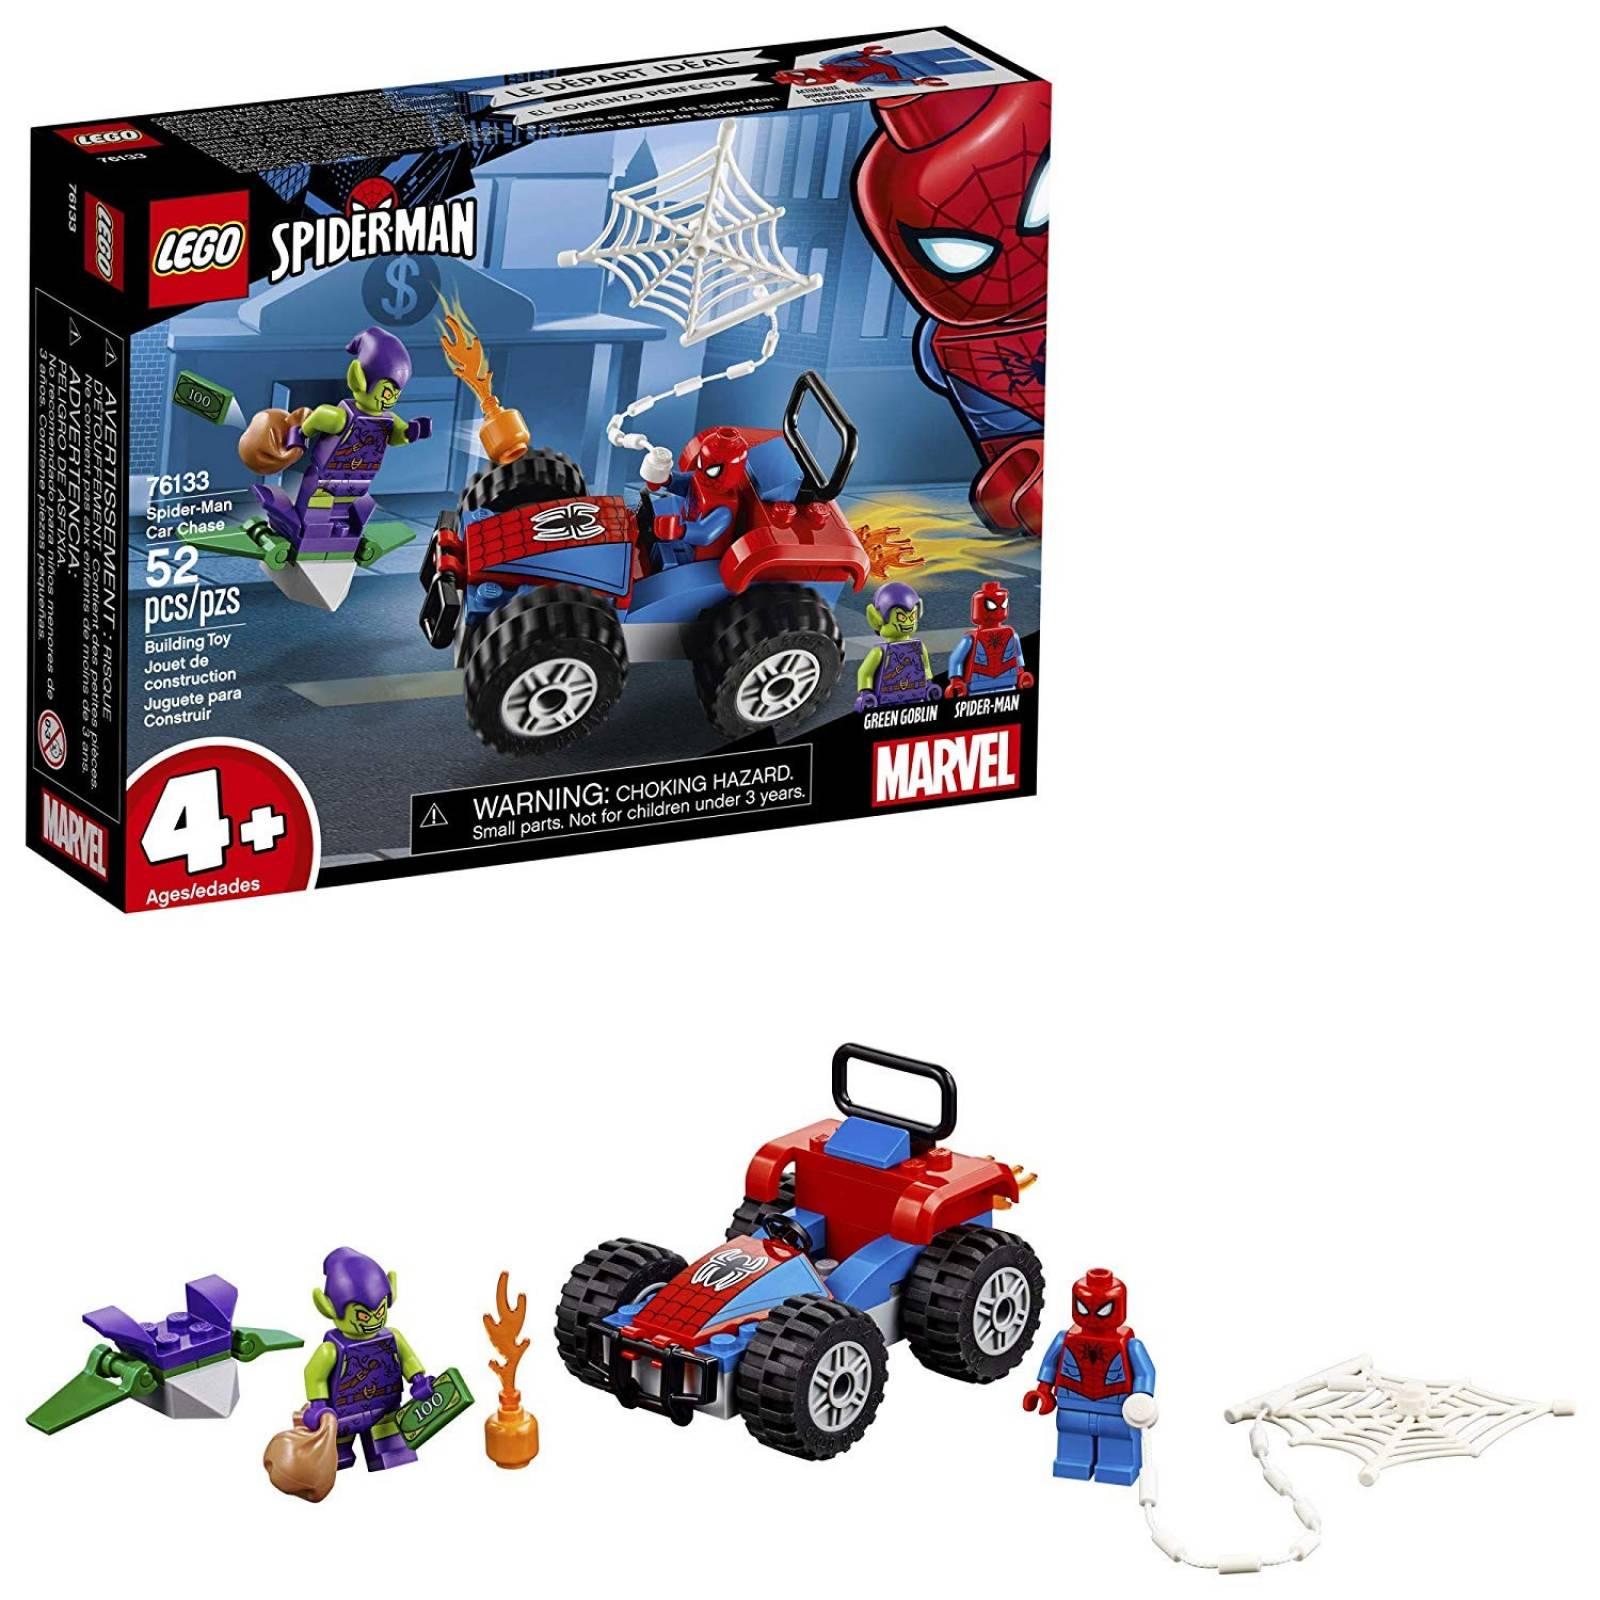 Juguete para construir LEGO 76133 Spiderman Car Chase 52 pzs